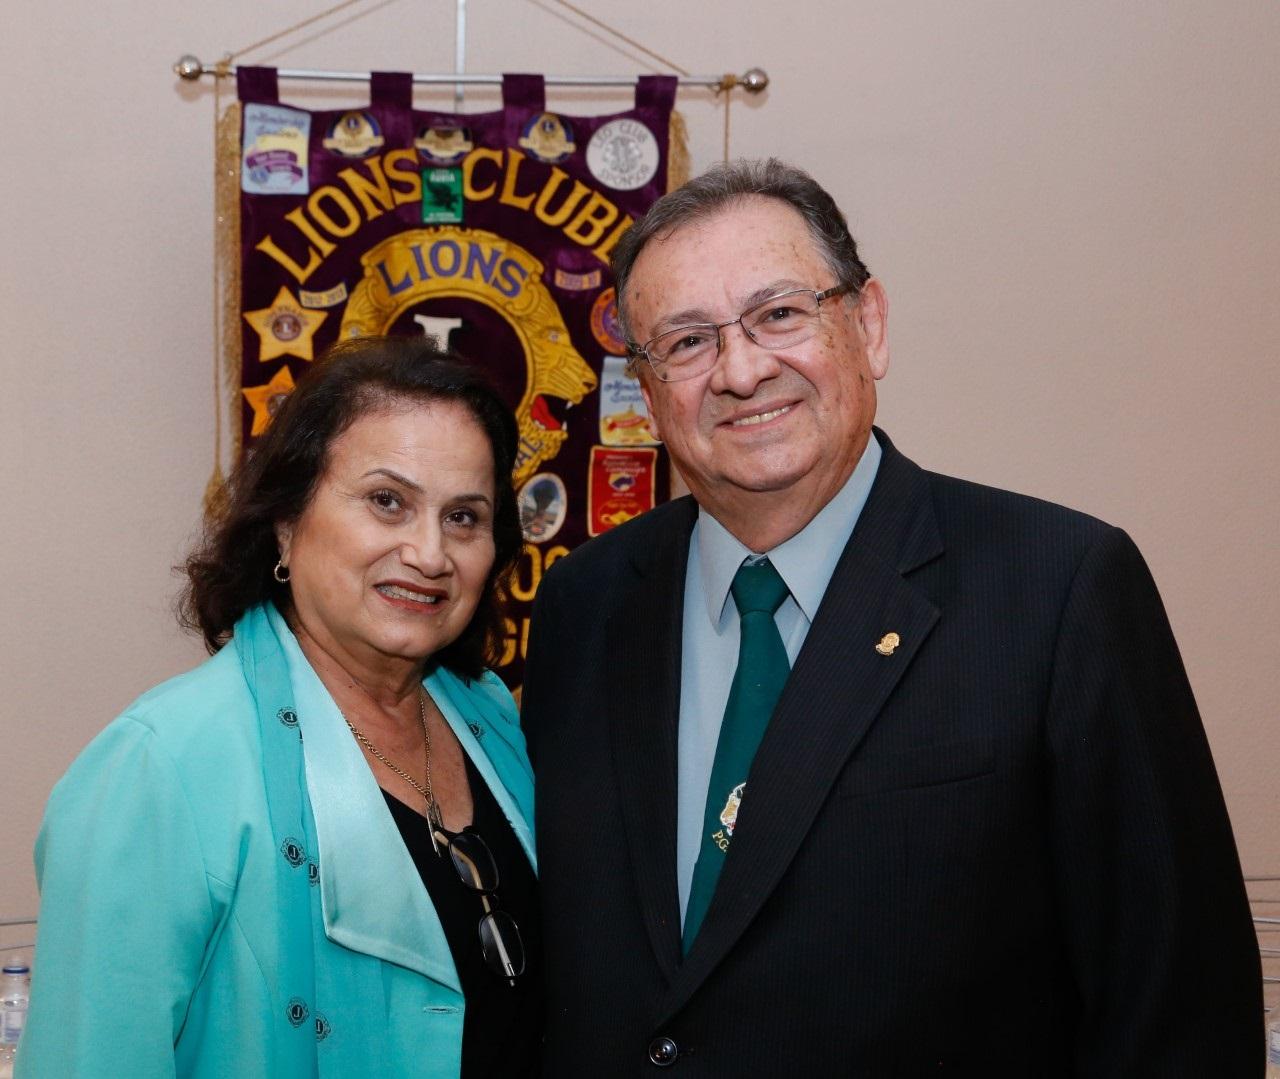 Marcy e Dr. Emigdio Enrique Orellana Jiménez